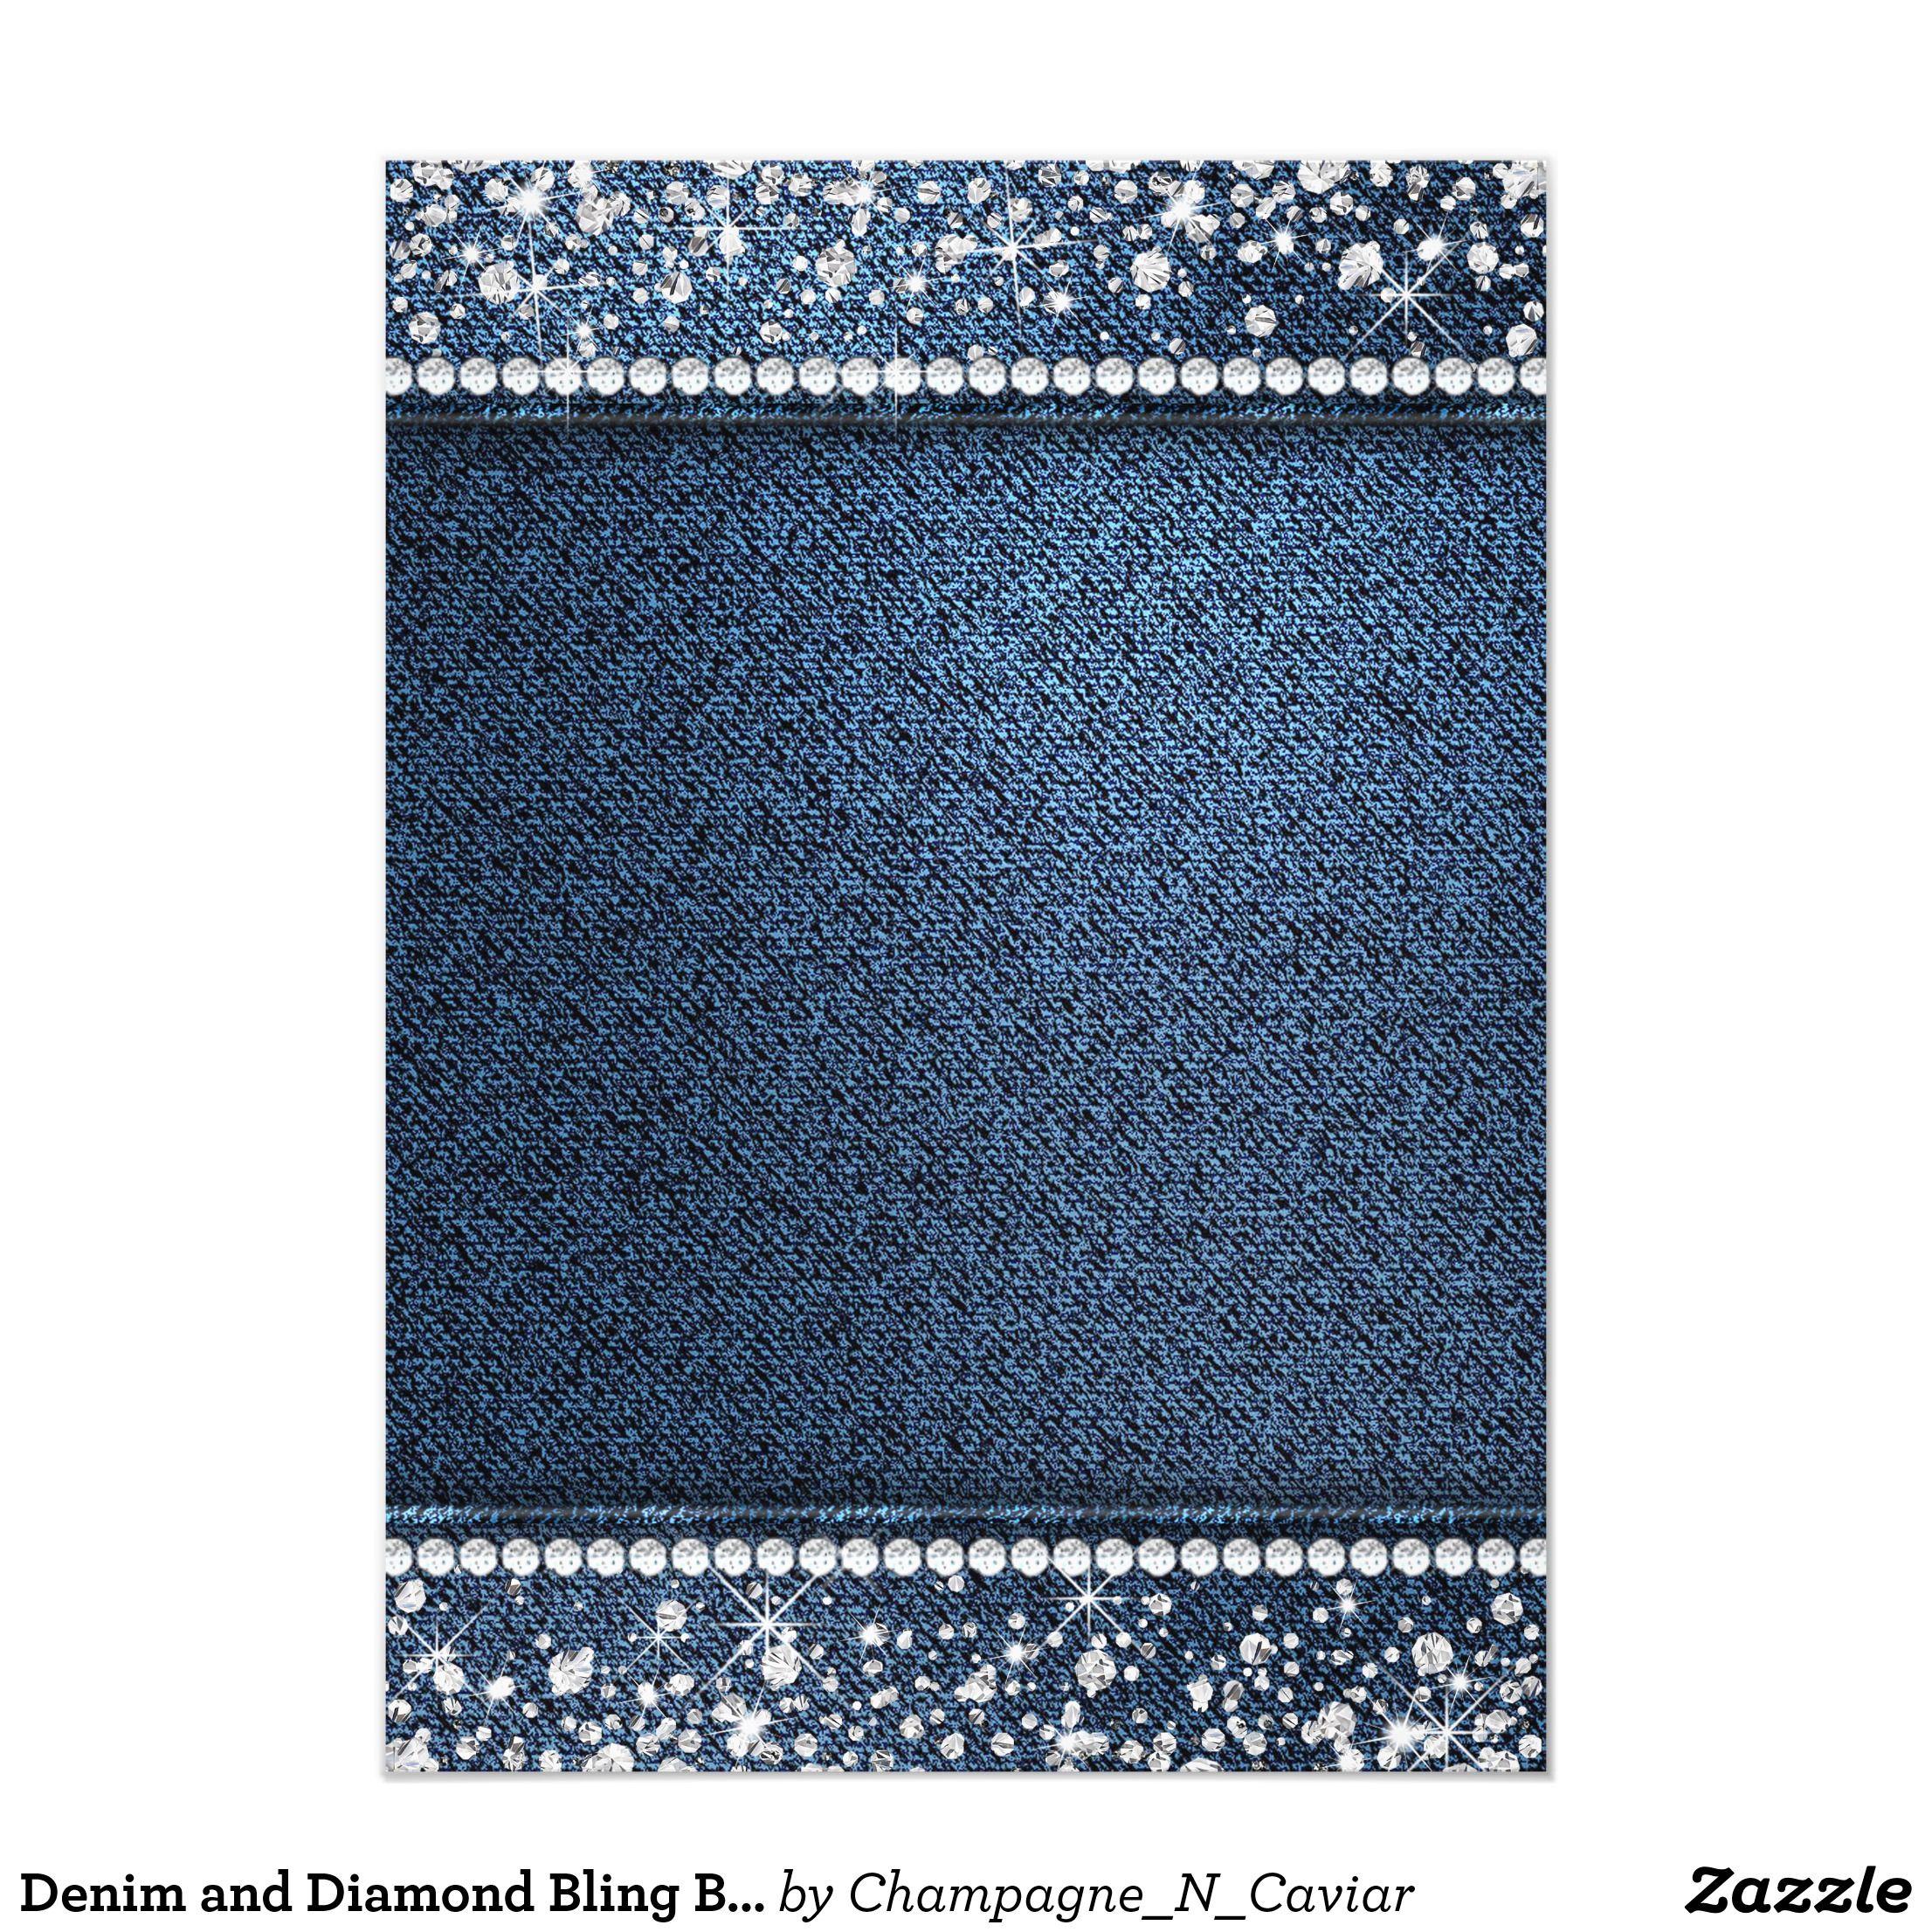 51 Denim And Diamonds Ideas Denim And Diamonds Diamond Party Denim Party